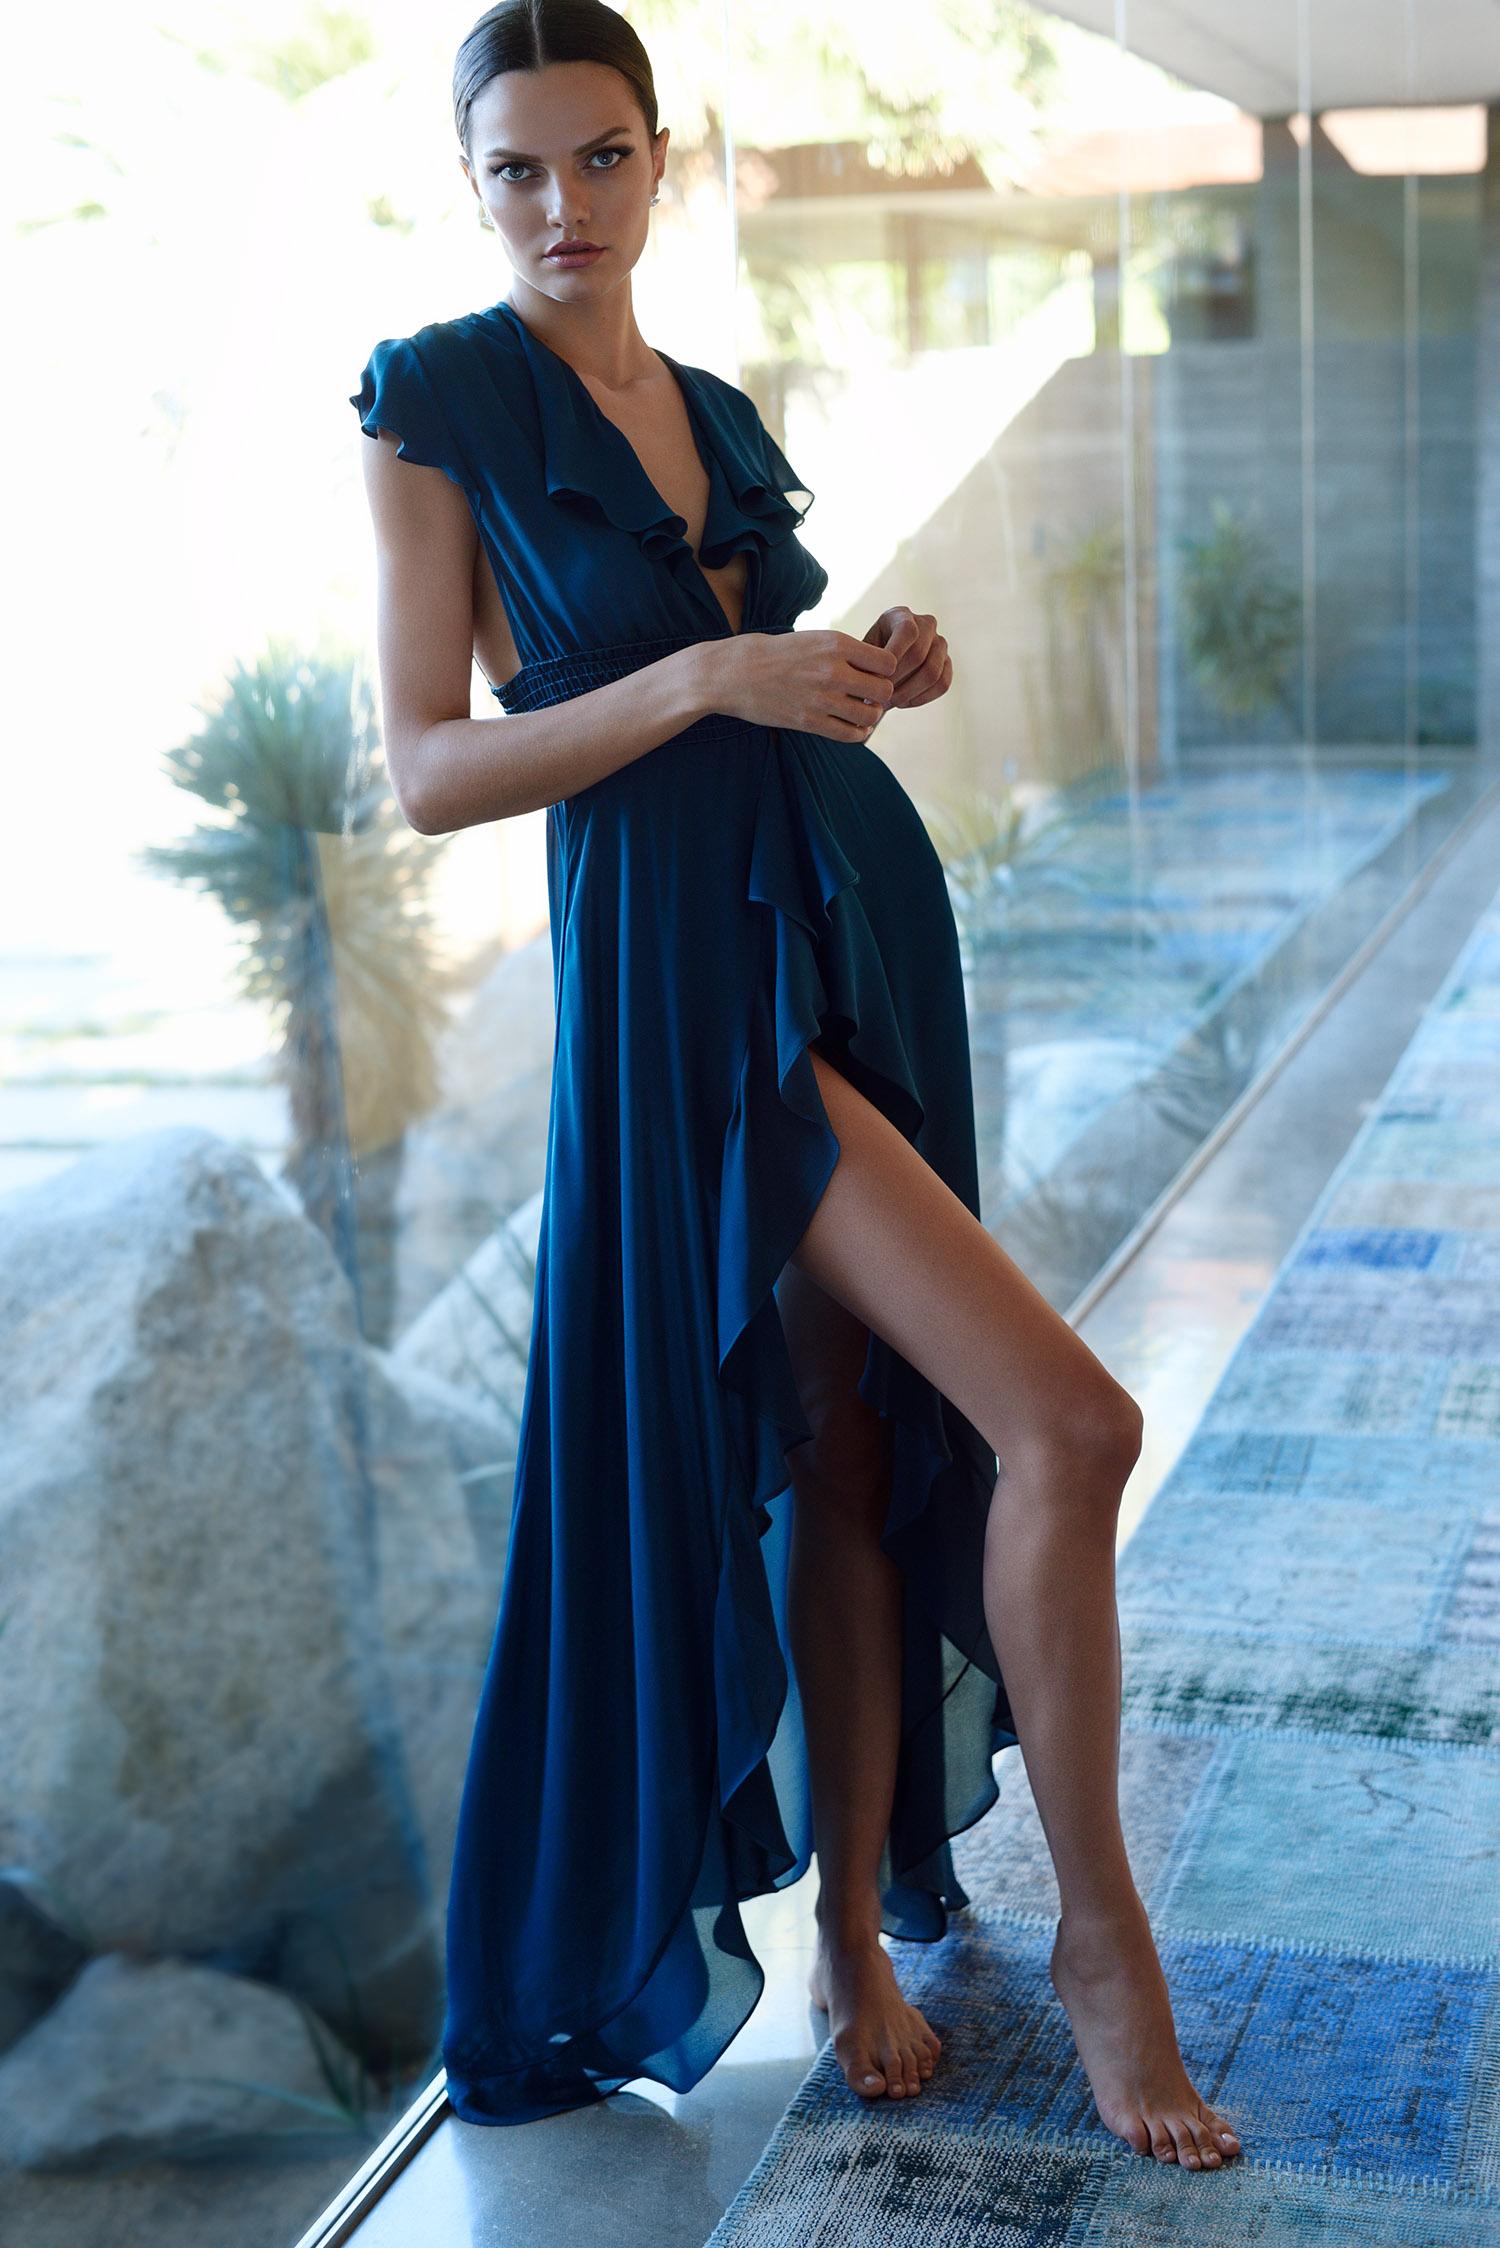 barbara-fialho-fashion-model-copyright-melis-dainon.jpg